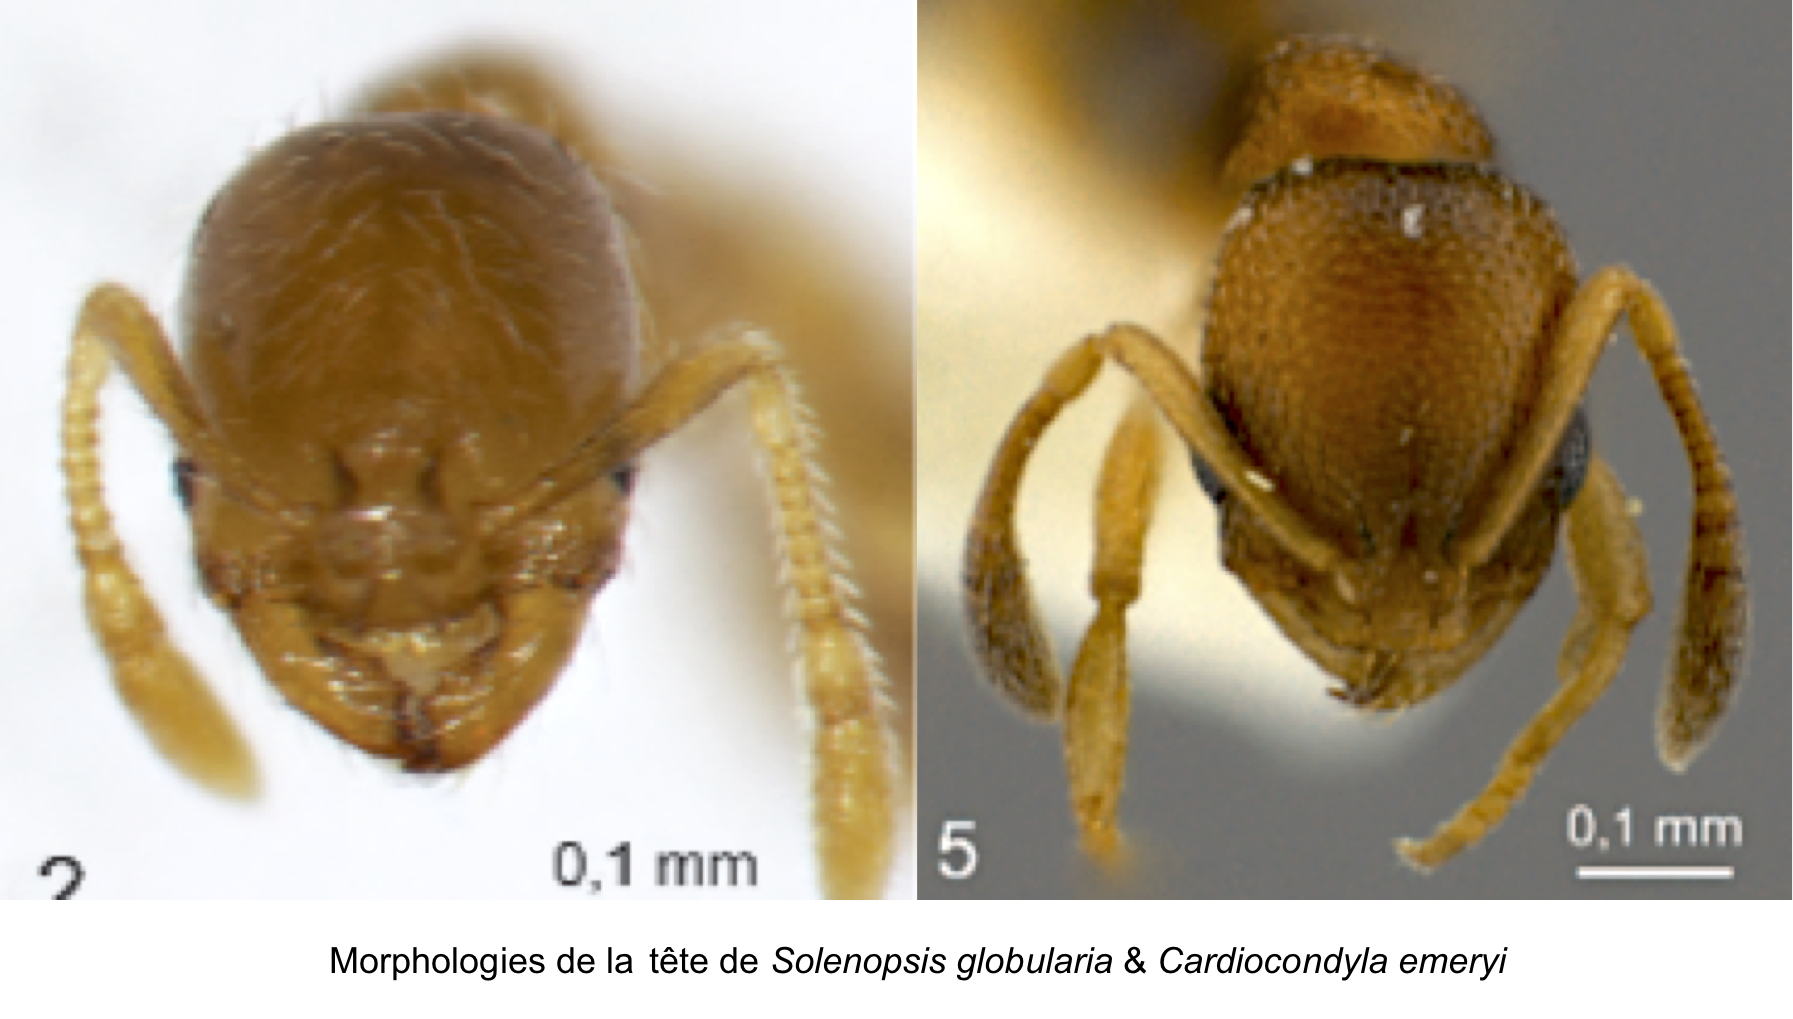 Solenopsis globularia & Cardiocondyla emeryi au Bulletin de la société entomologique de France